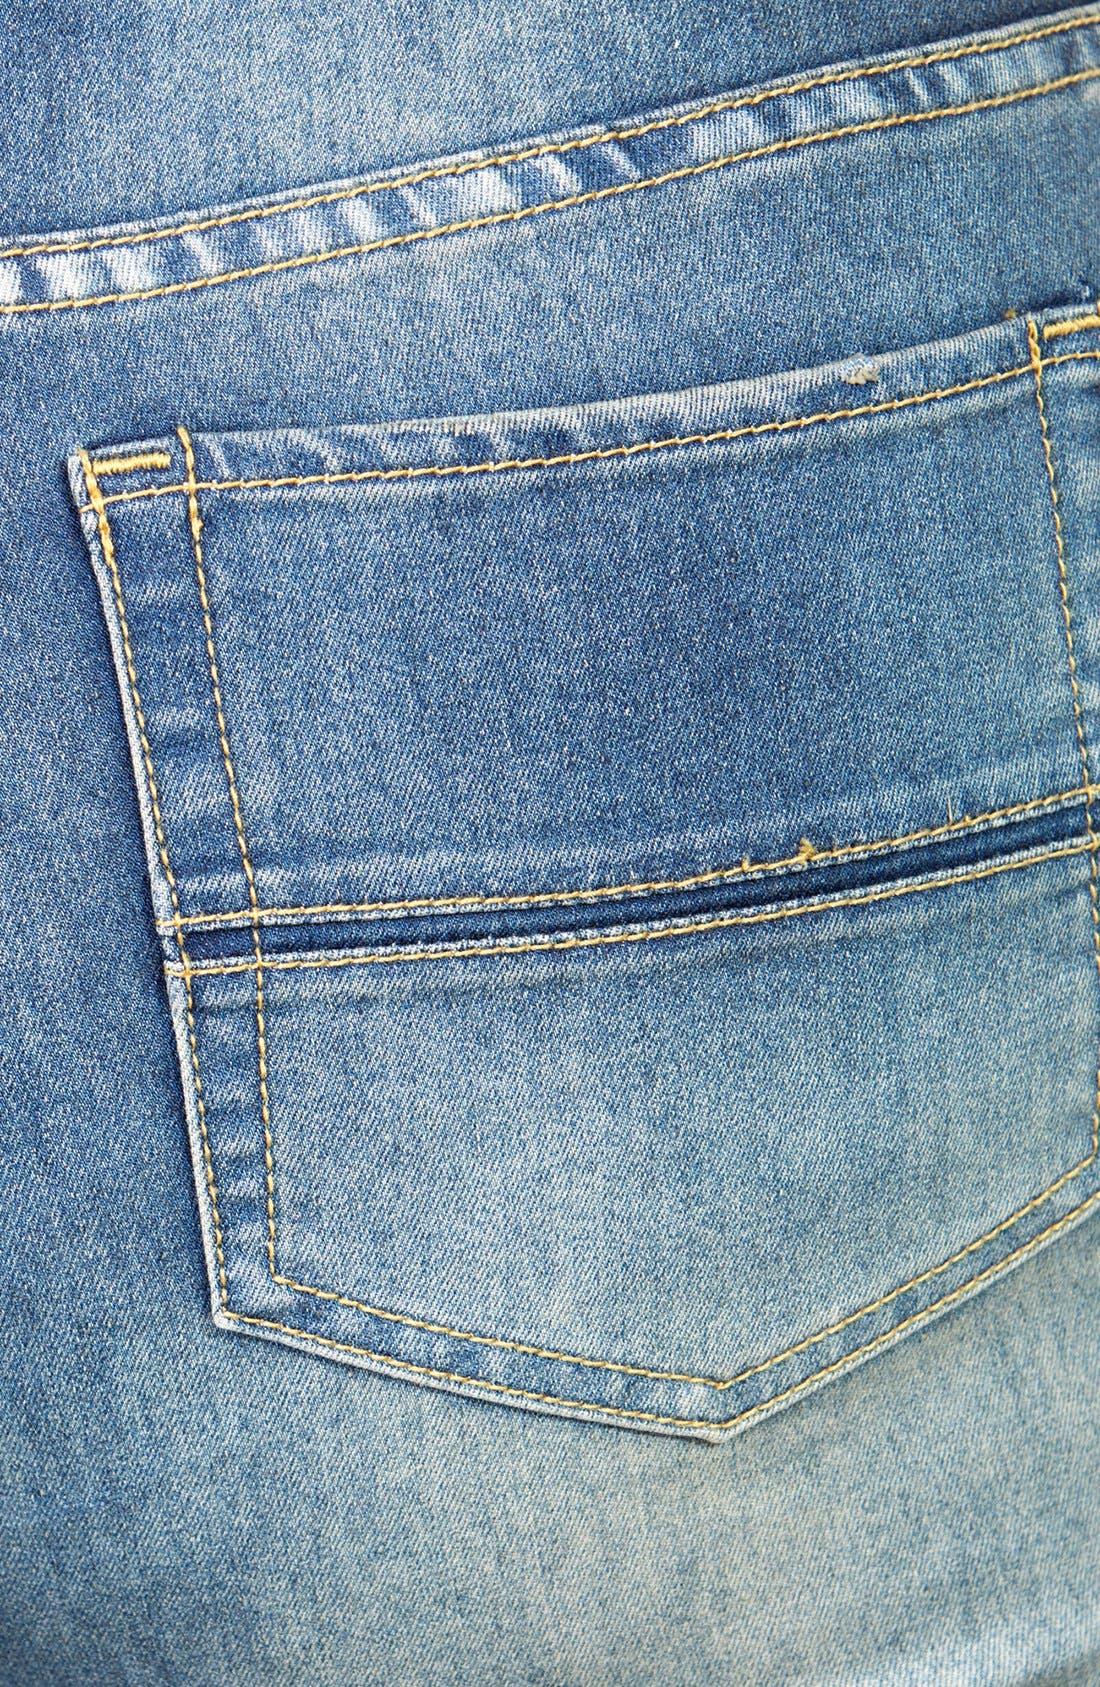 Alternate Image 3  - City Chic Soft Wash Bootcut Jeans (Mid Denim) (Plus Size)